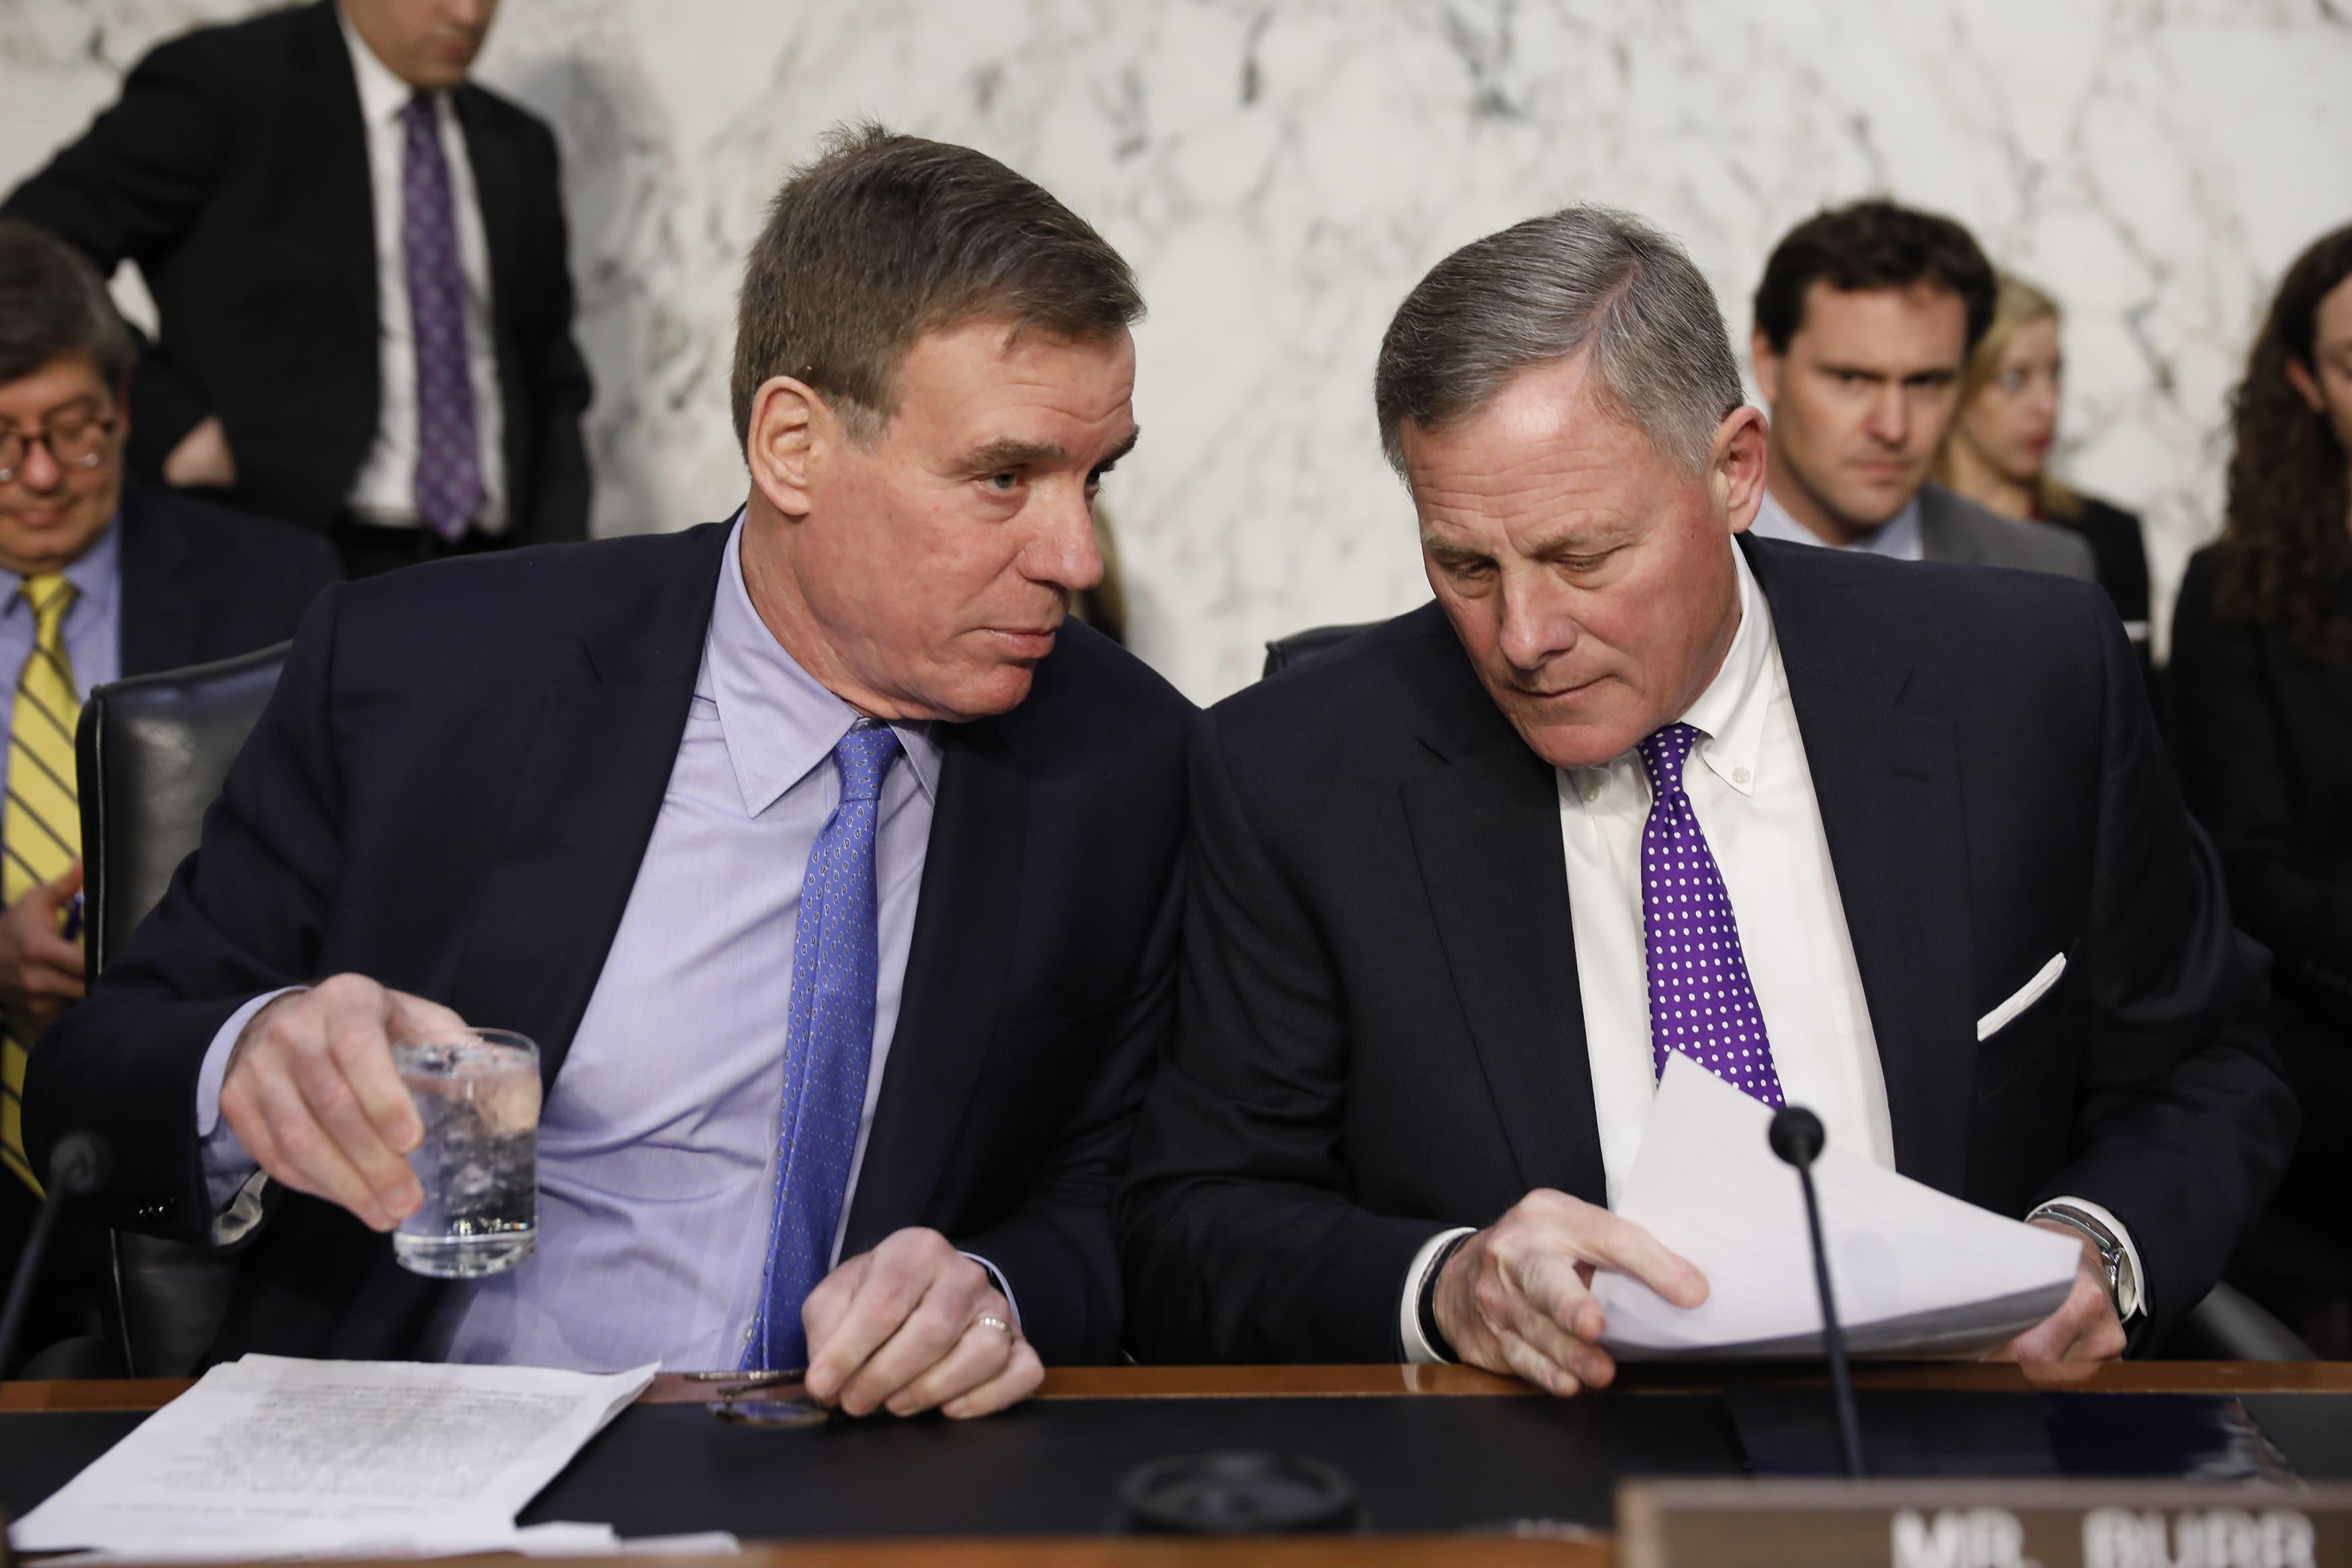 Bipartisan U.S. Senate report backs spy agencies' findings on Russian Federation